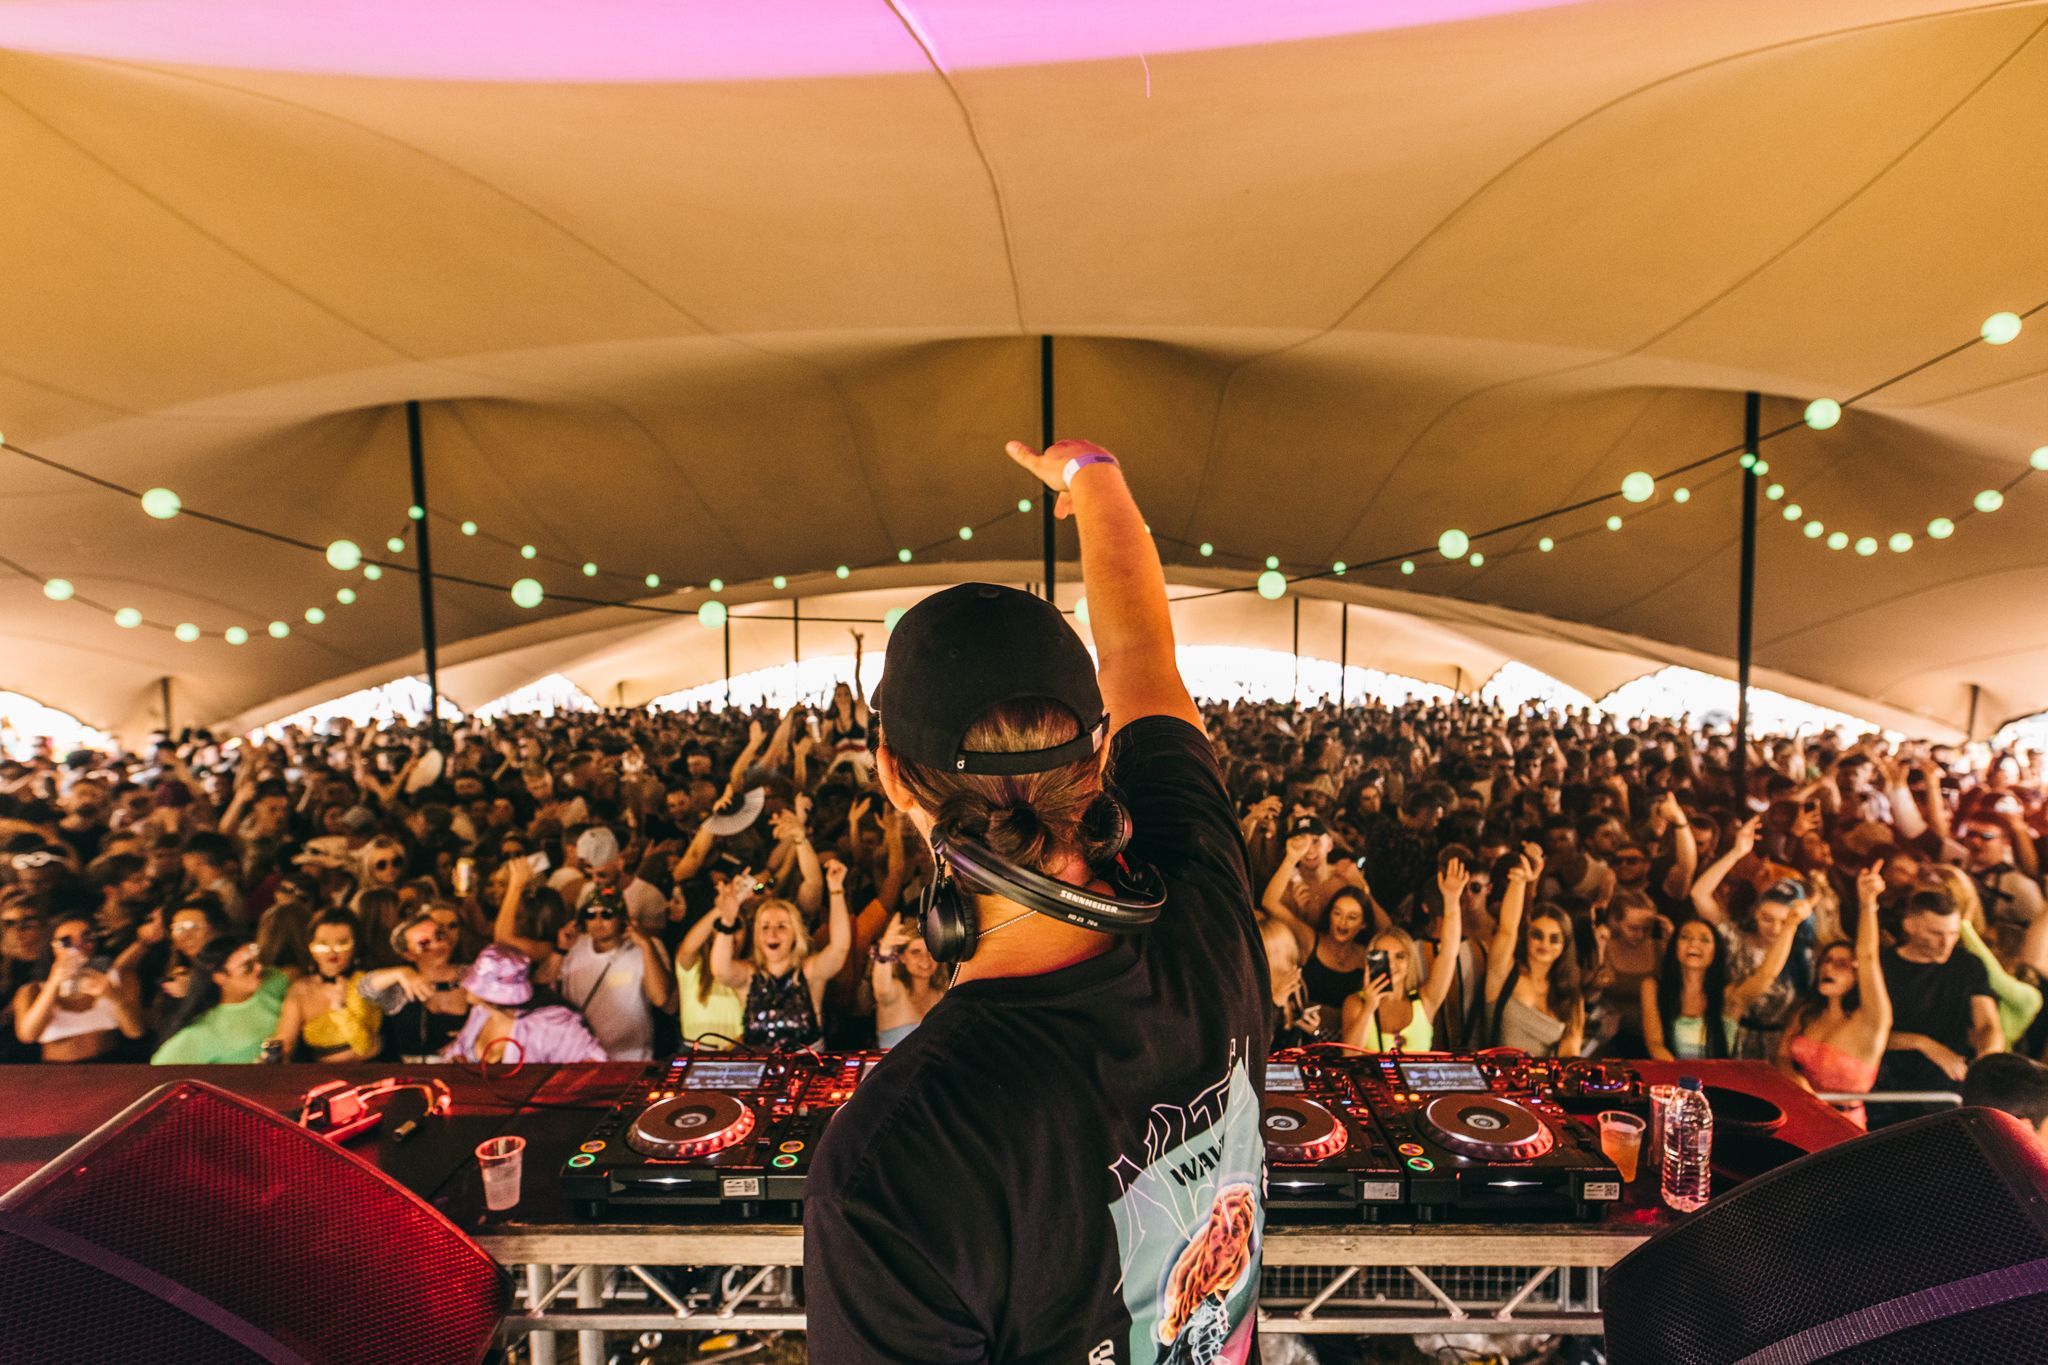 Birmingham Prepares For Its Biggest Weekend Of Live Music Since Lockdown